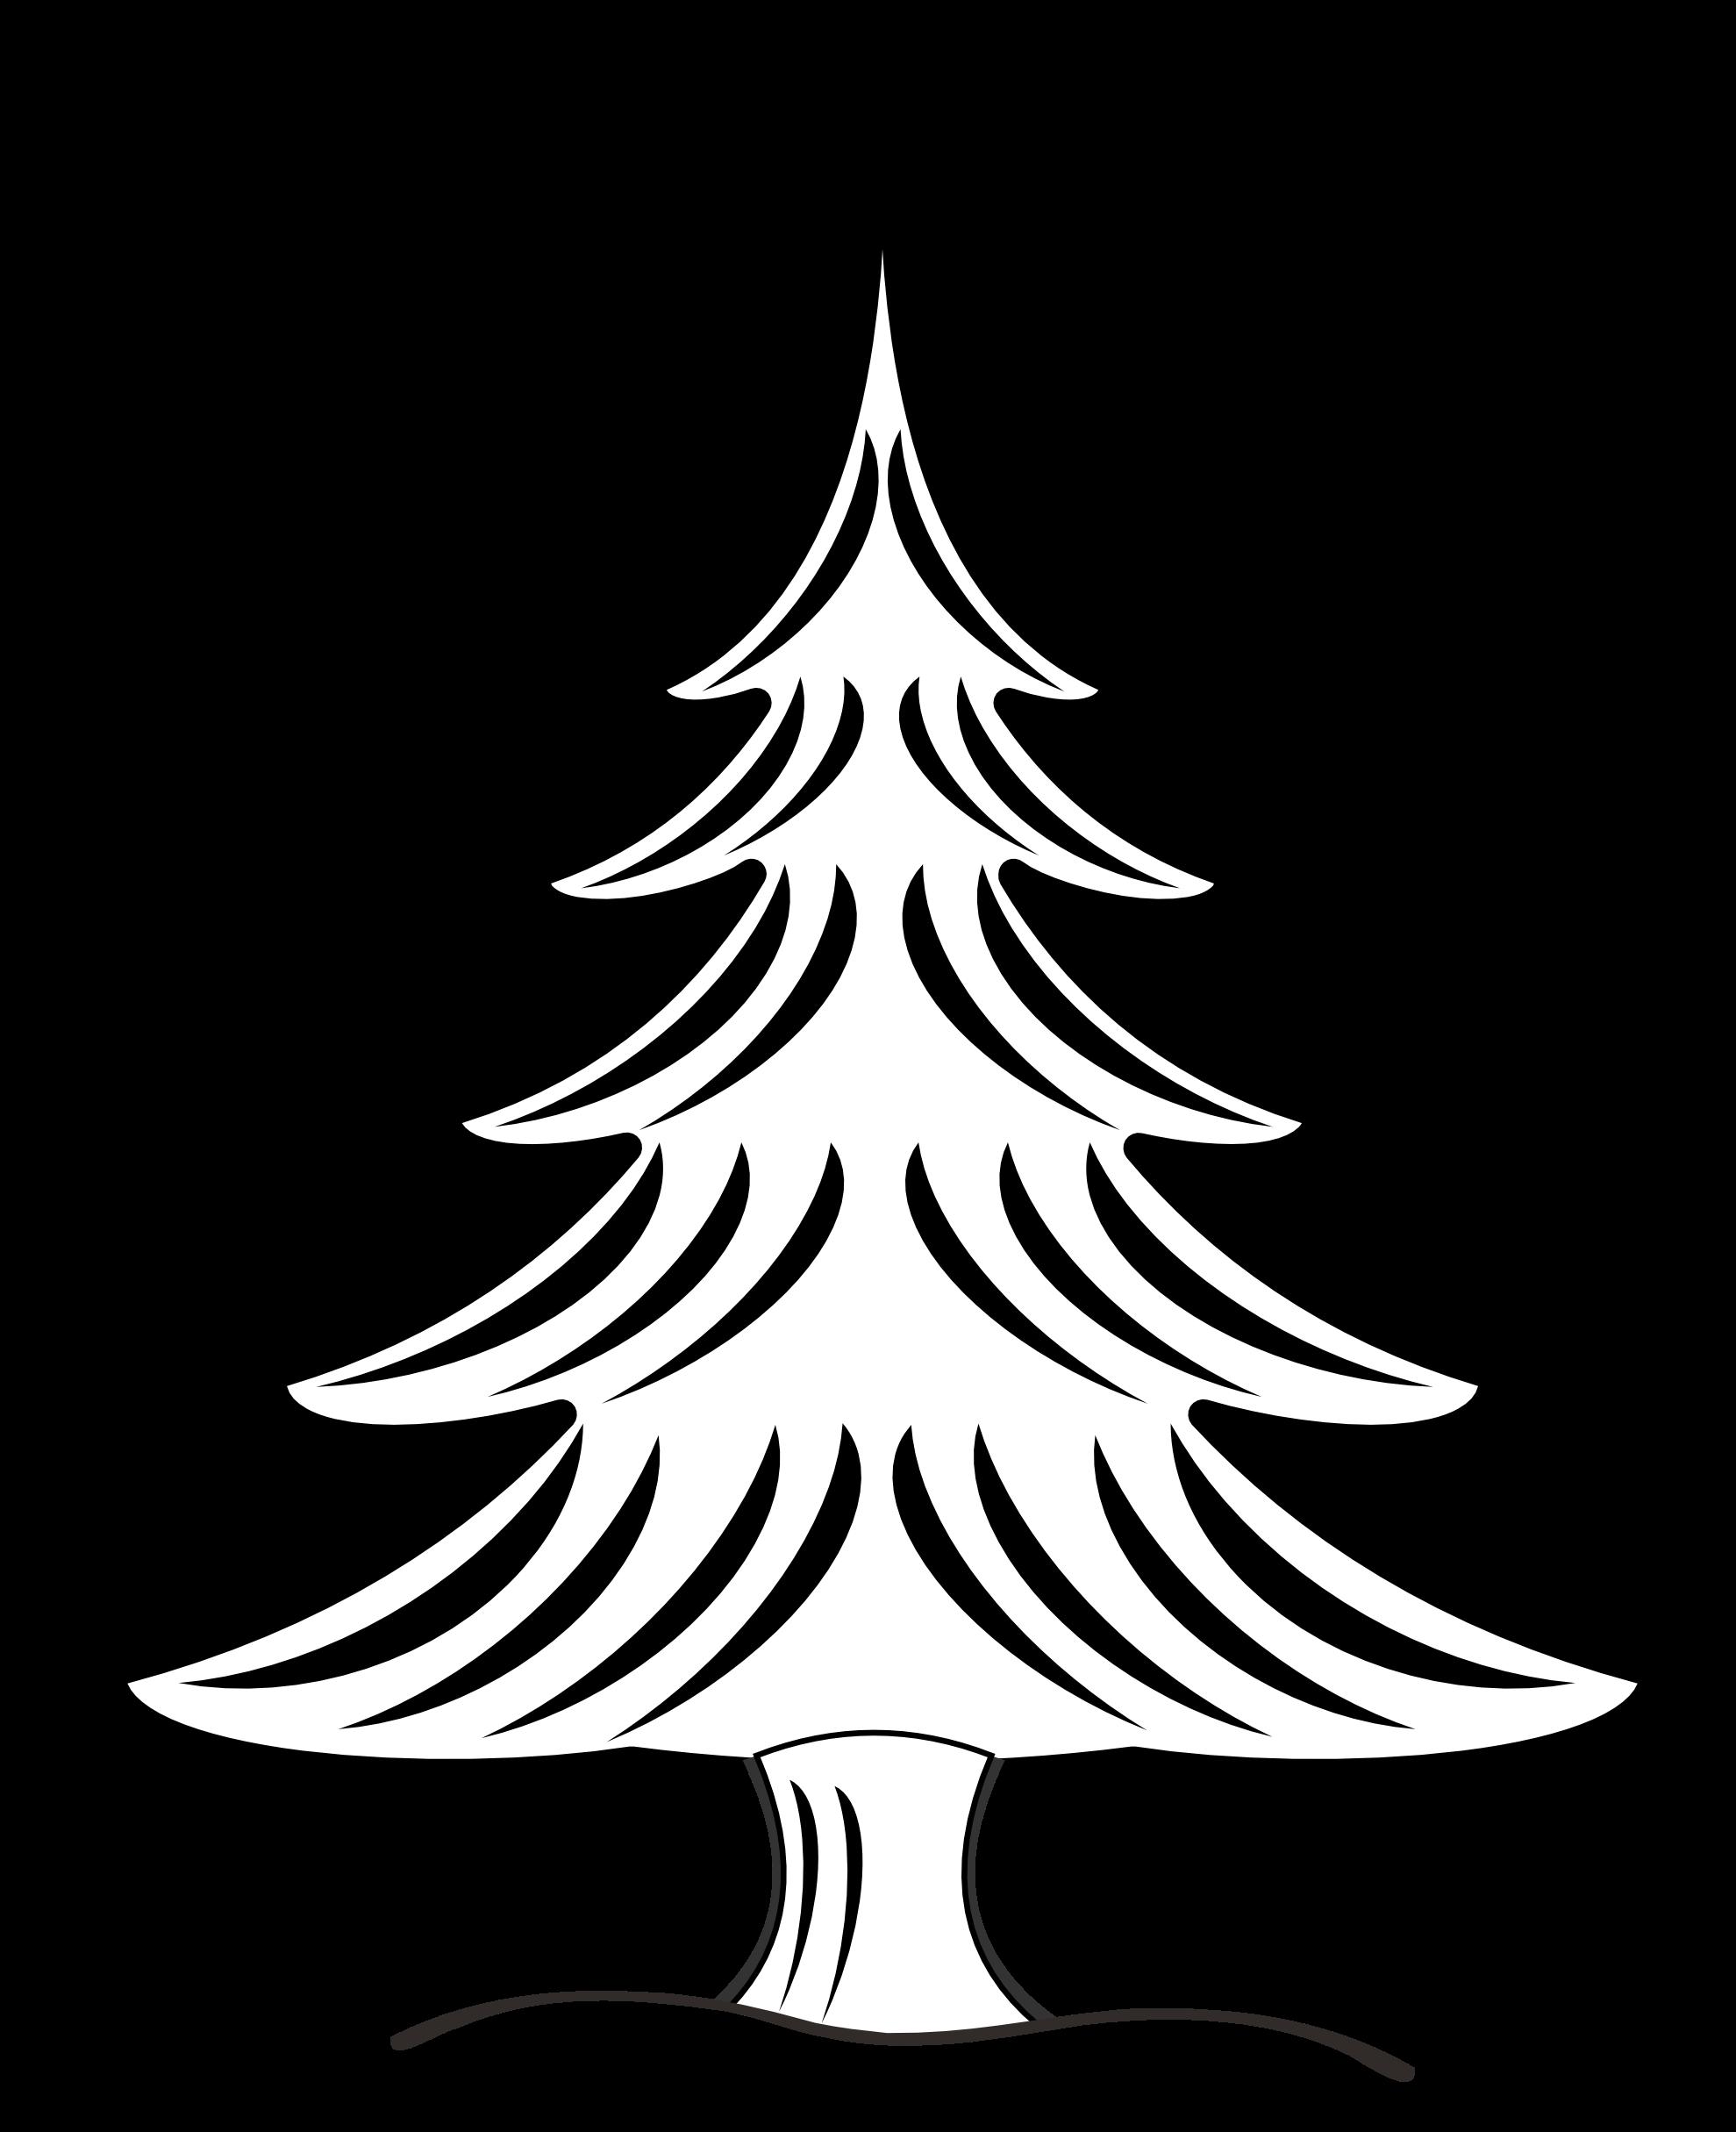 1979x2430 Pinecone Clipart Longleaf Pine, Pinecone Longleaf Pine Transparent